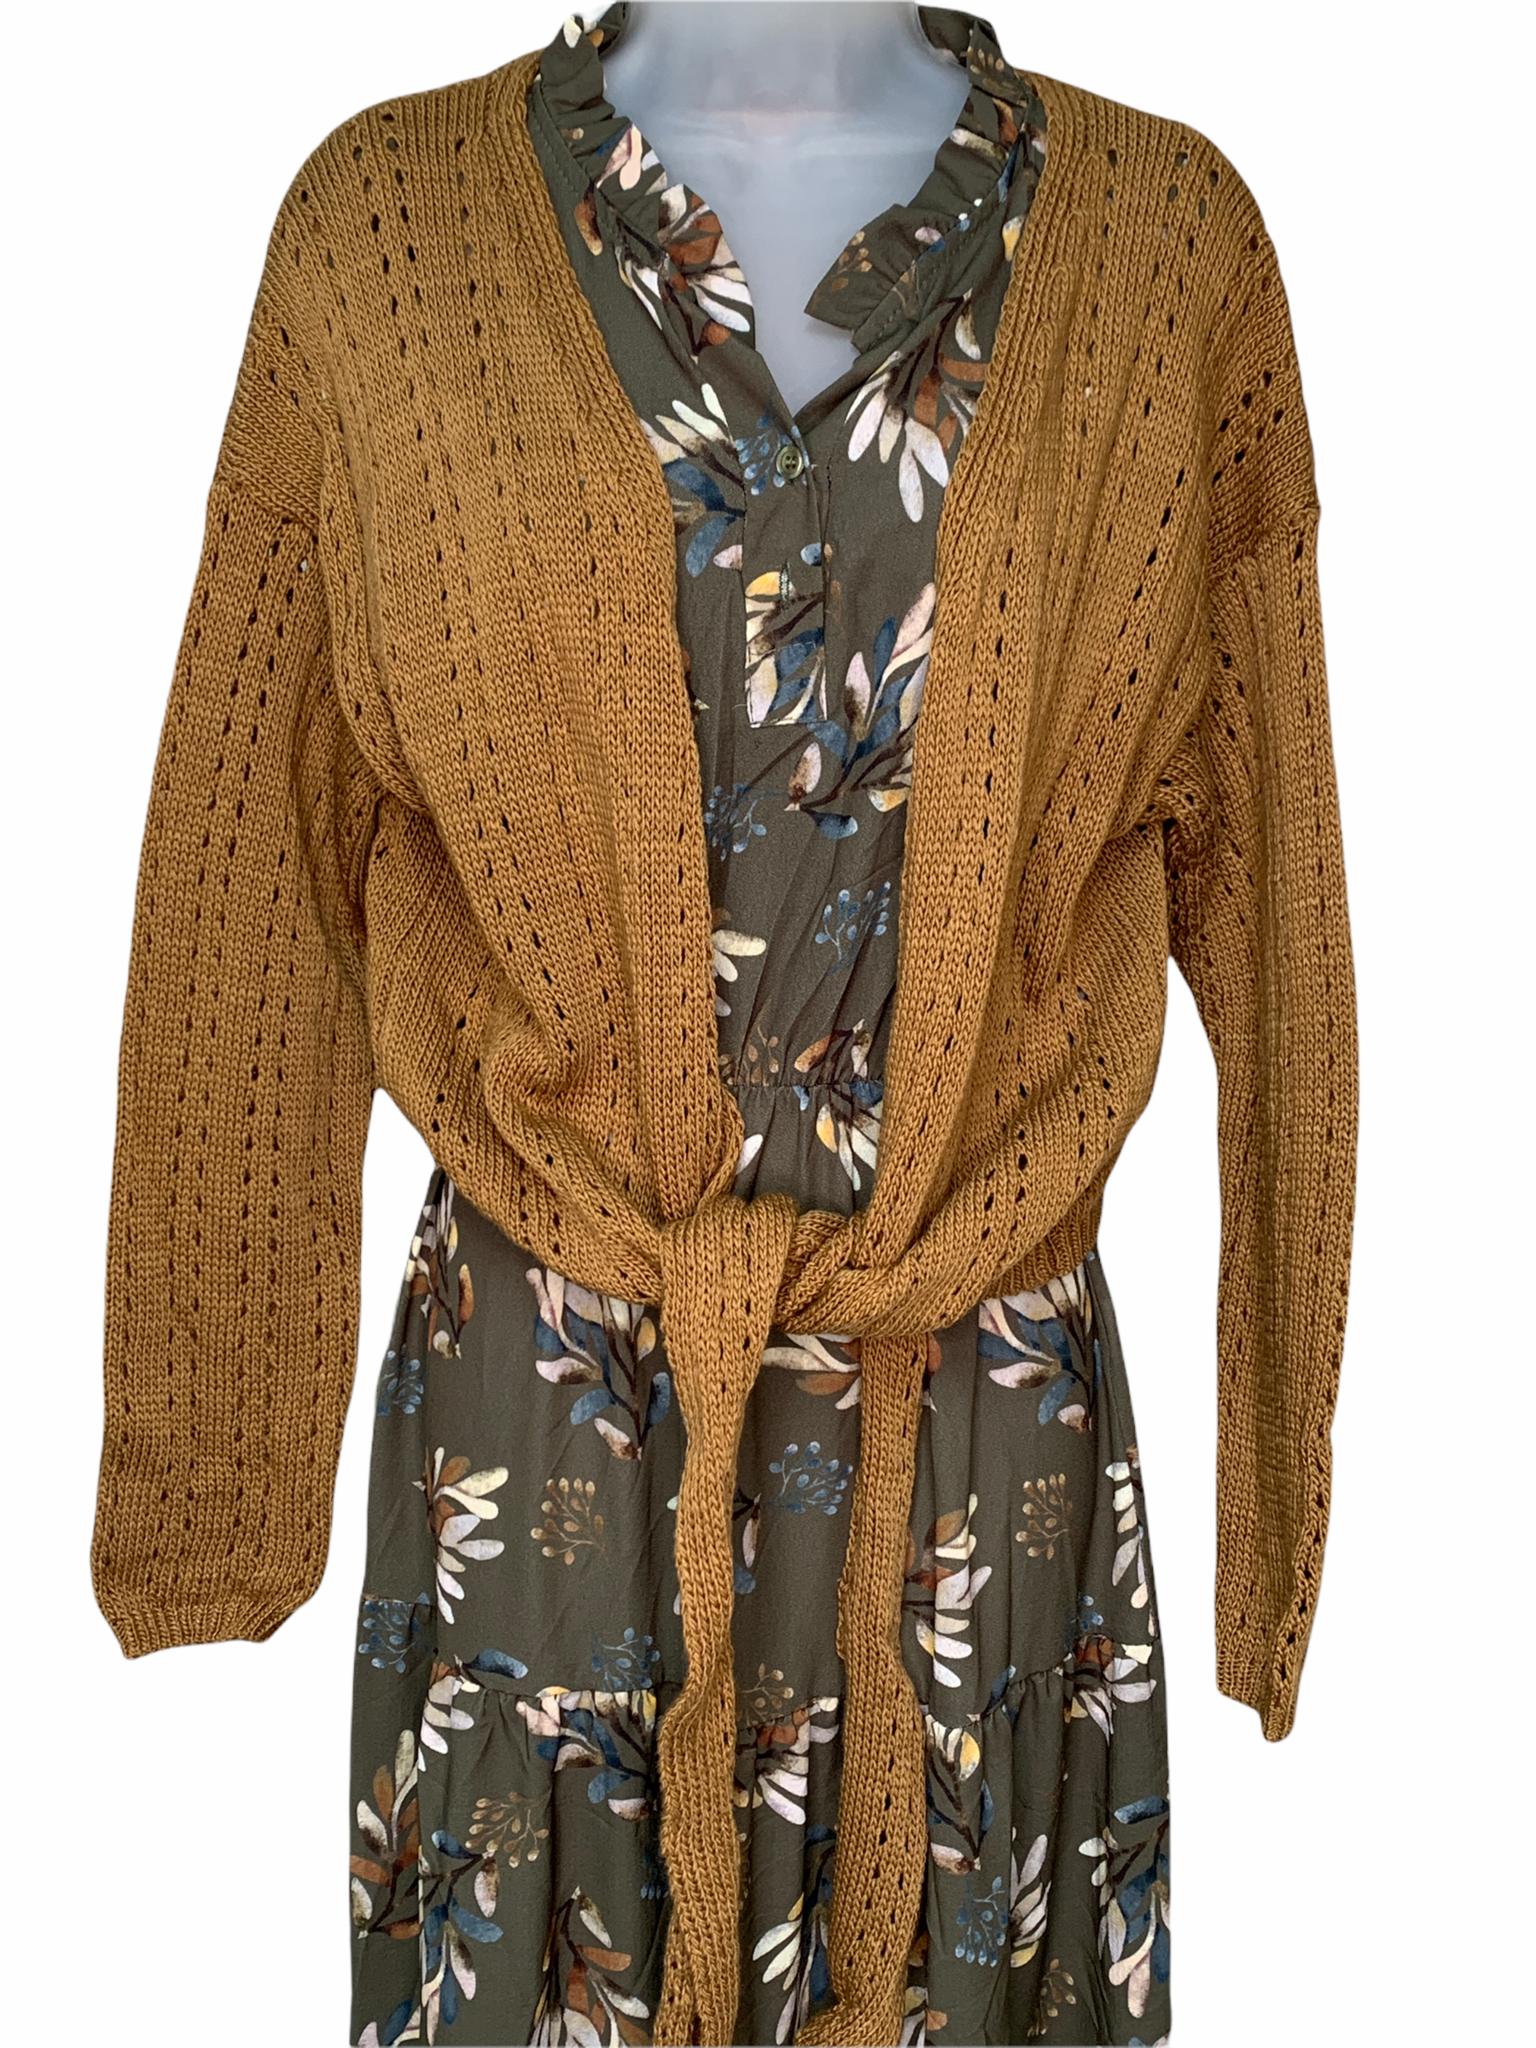 One-Size Knit Cardigan with Tie - Tan